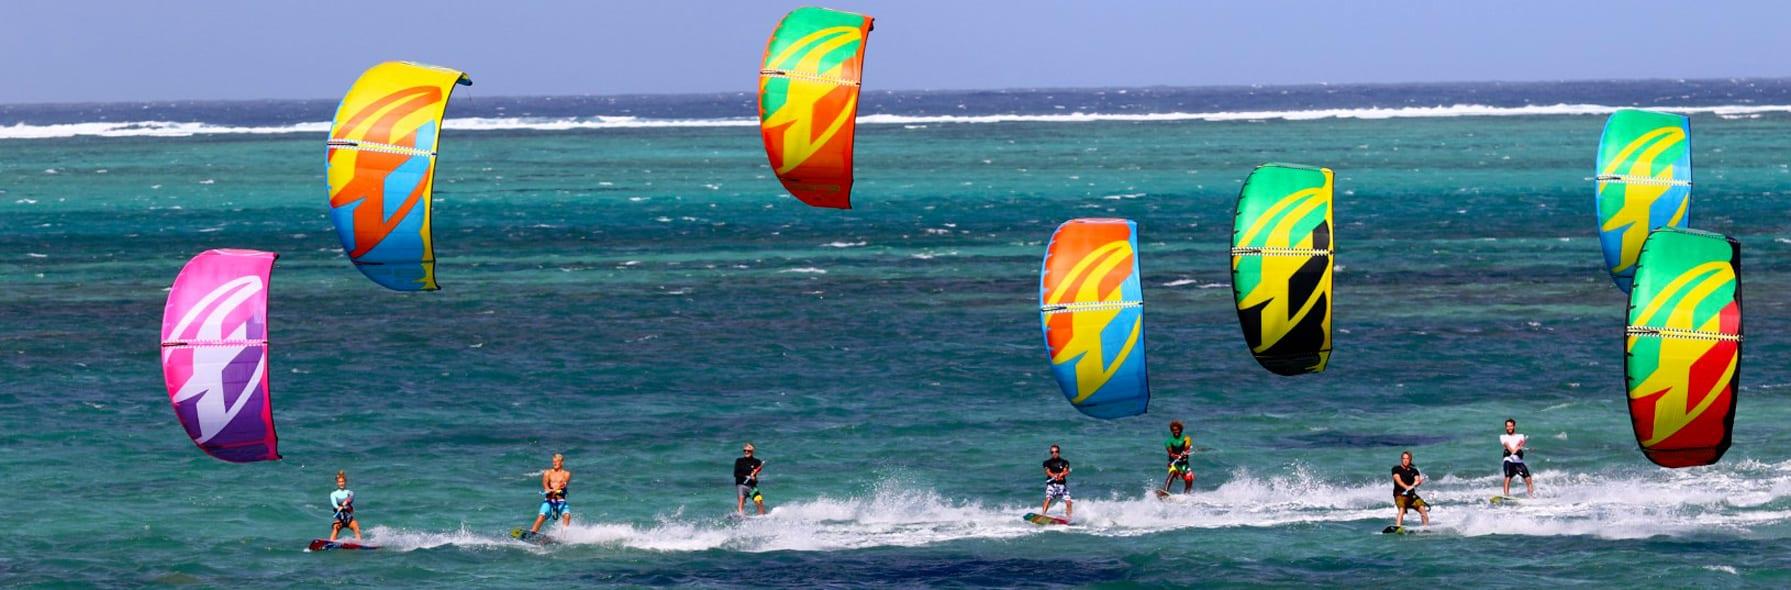 Surf Loisirs kitesurf F one